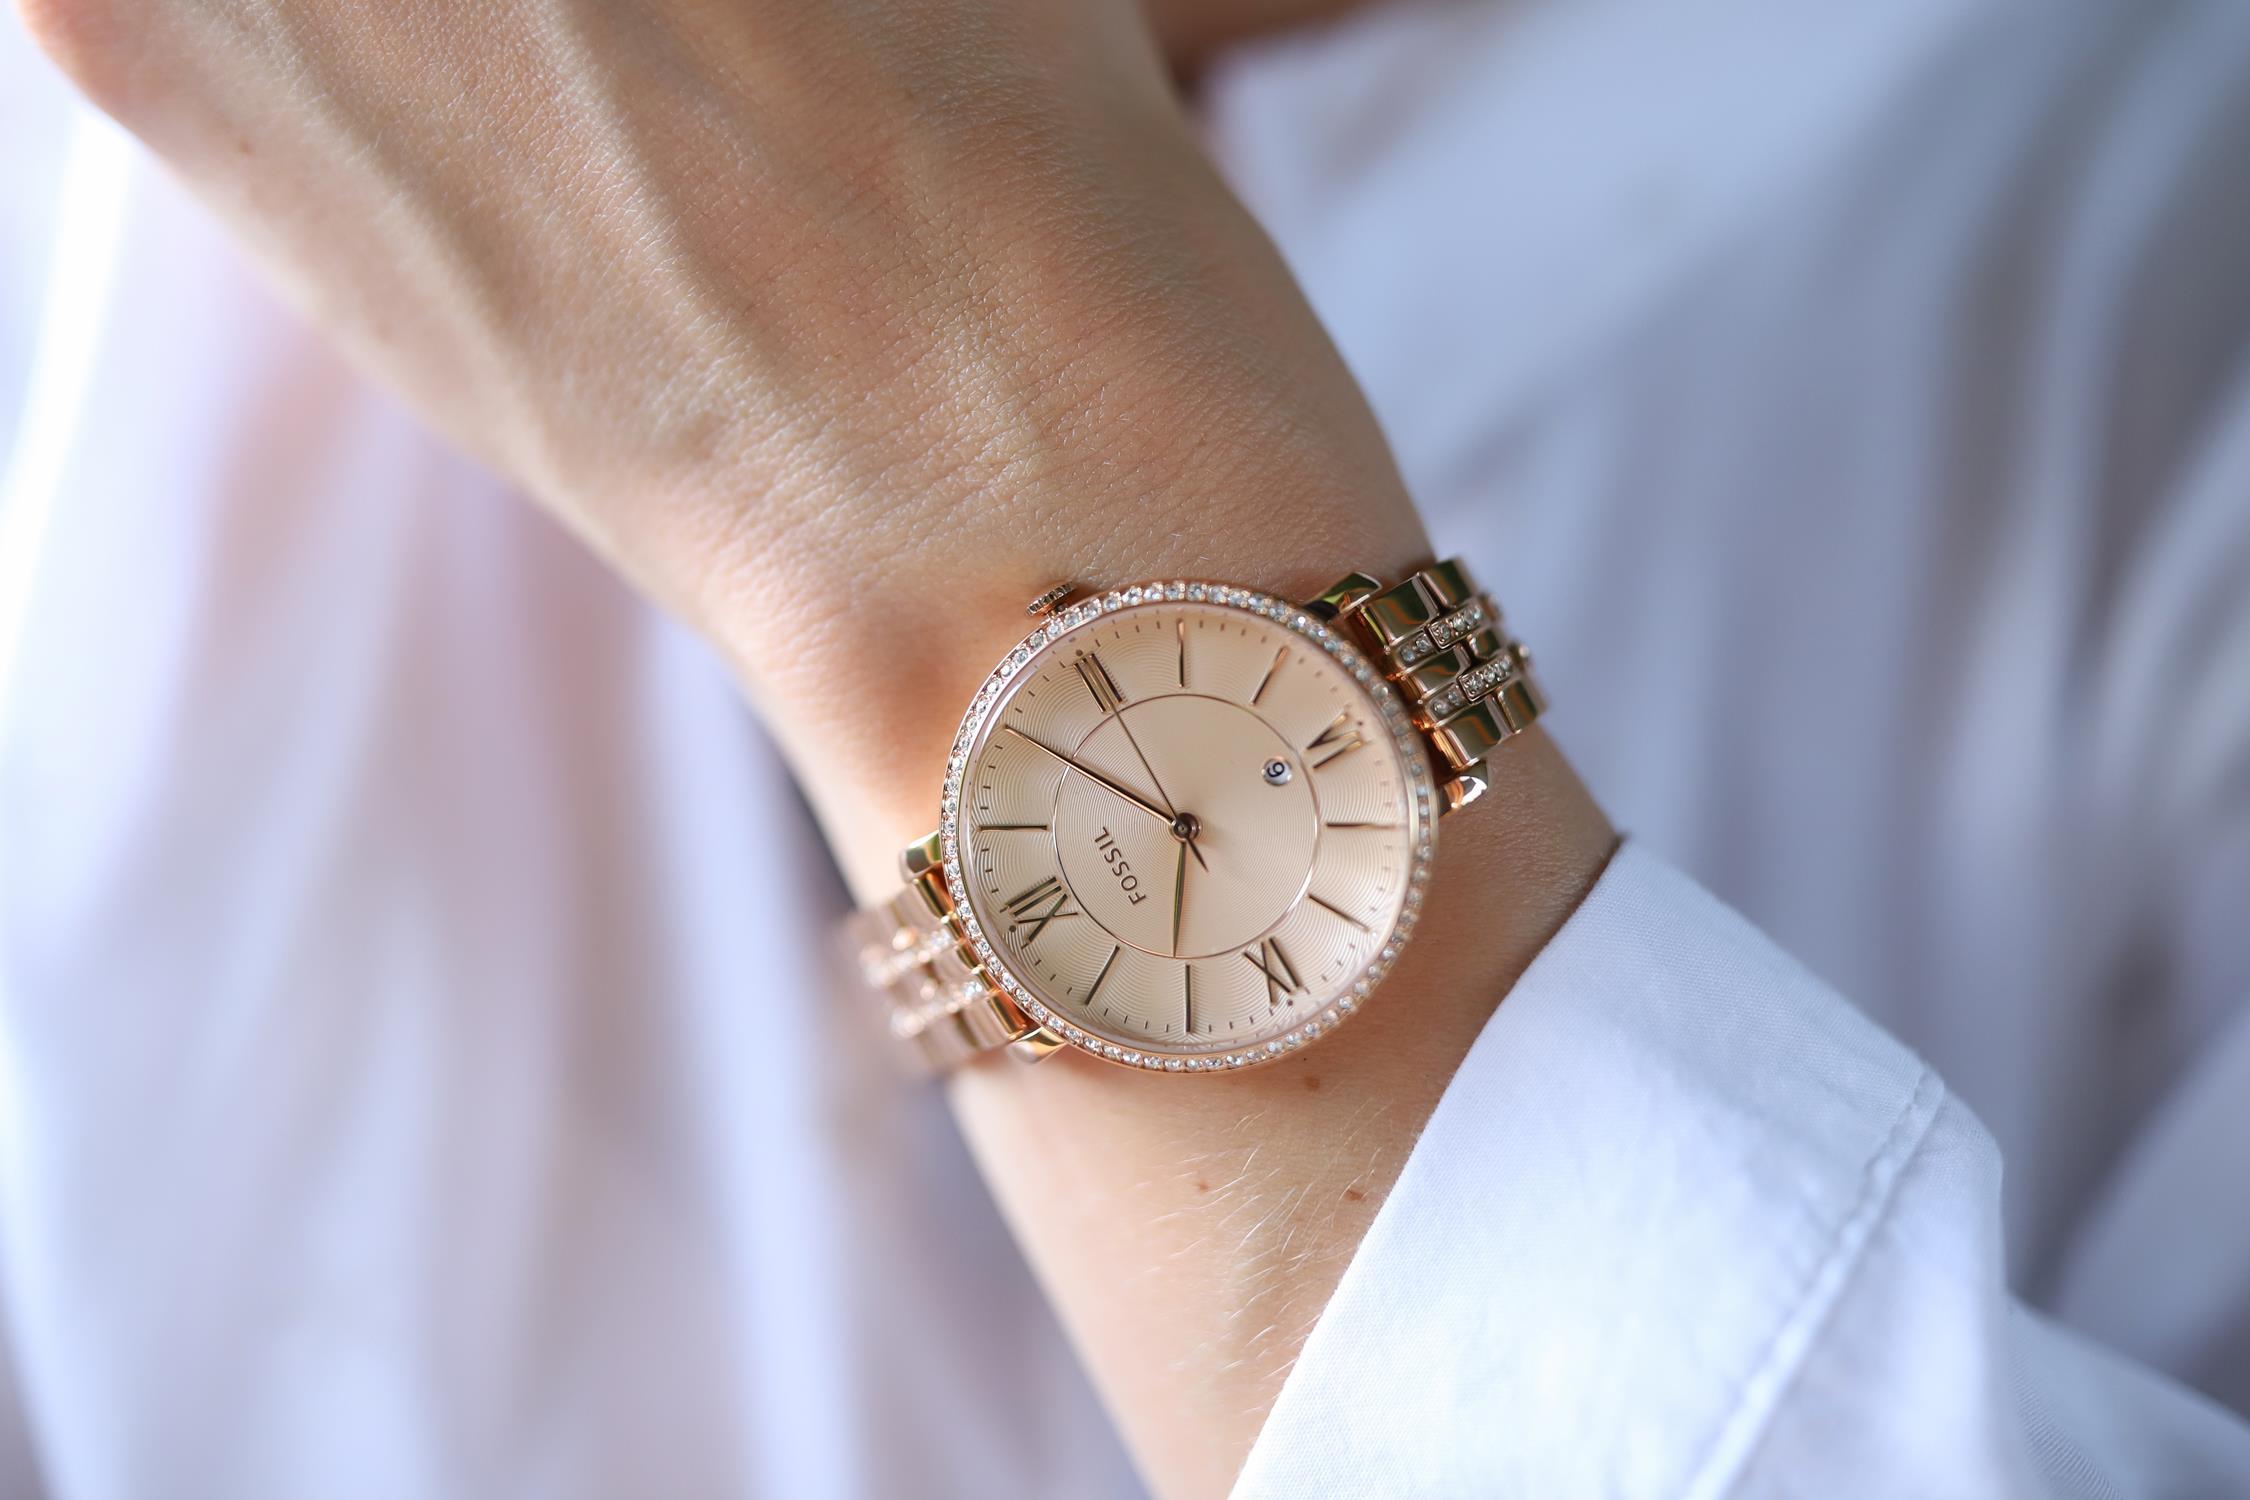 zegarek fossil na reku